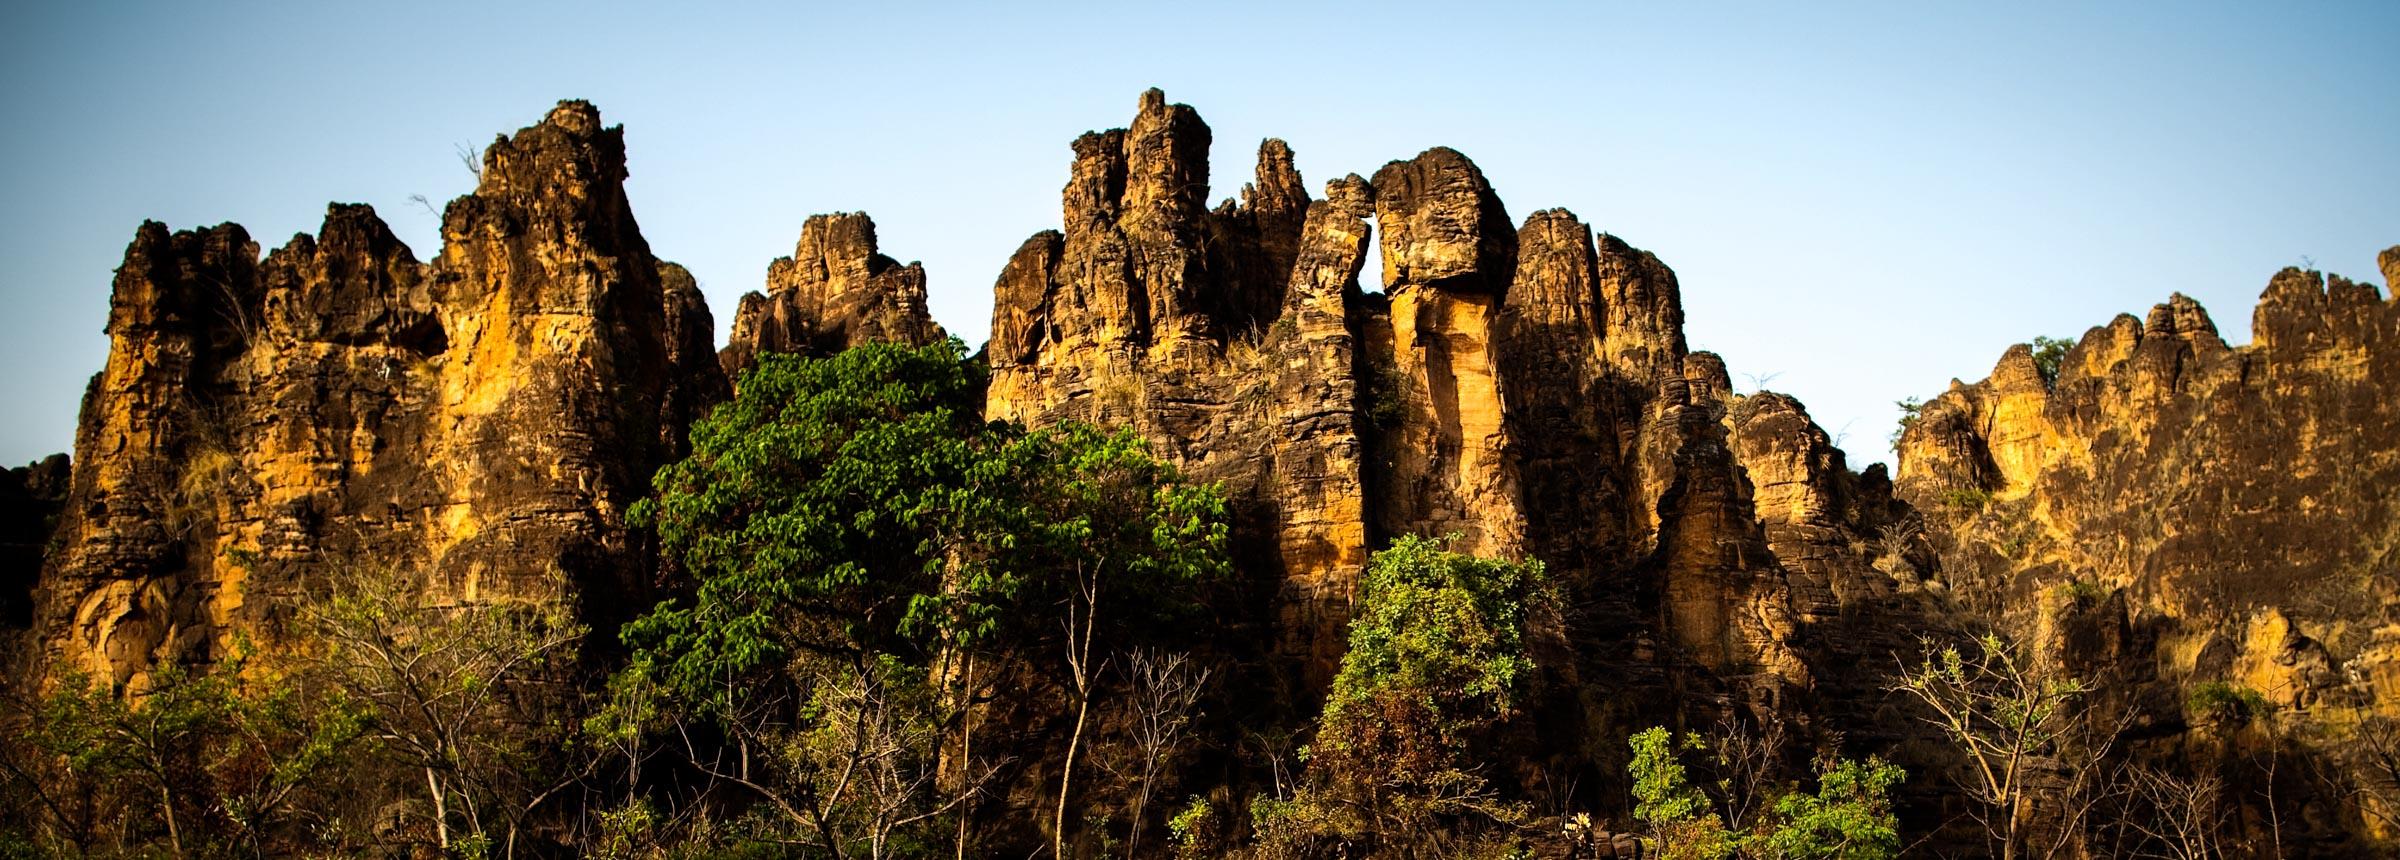 Burkina Faso landscape